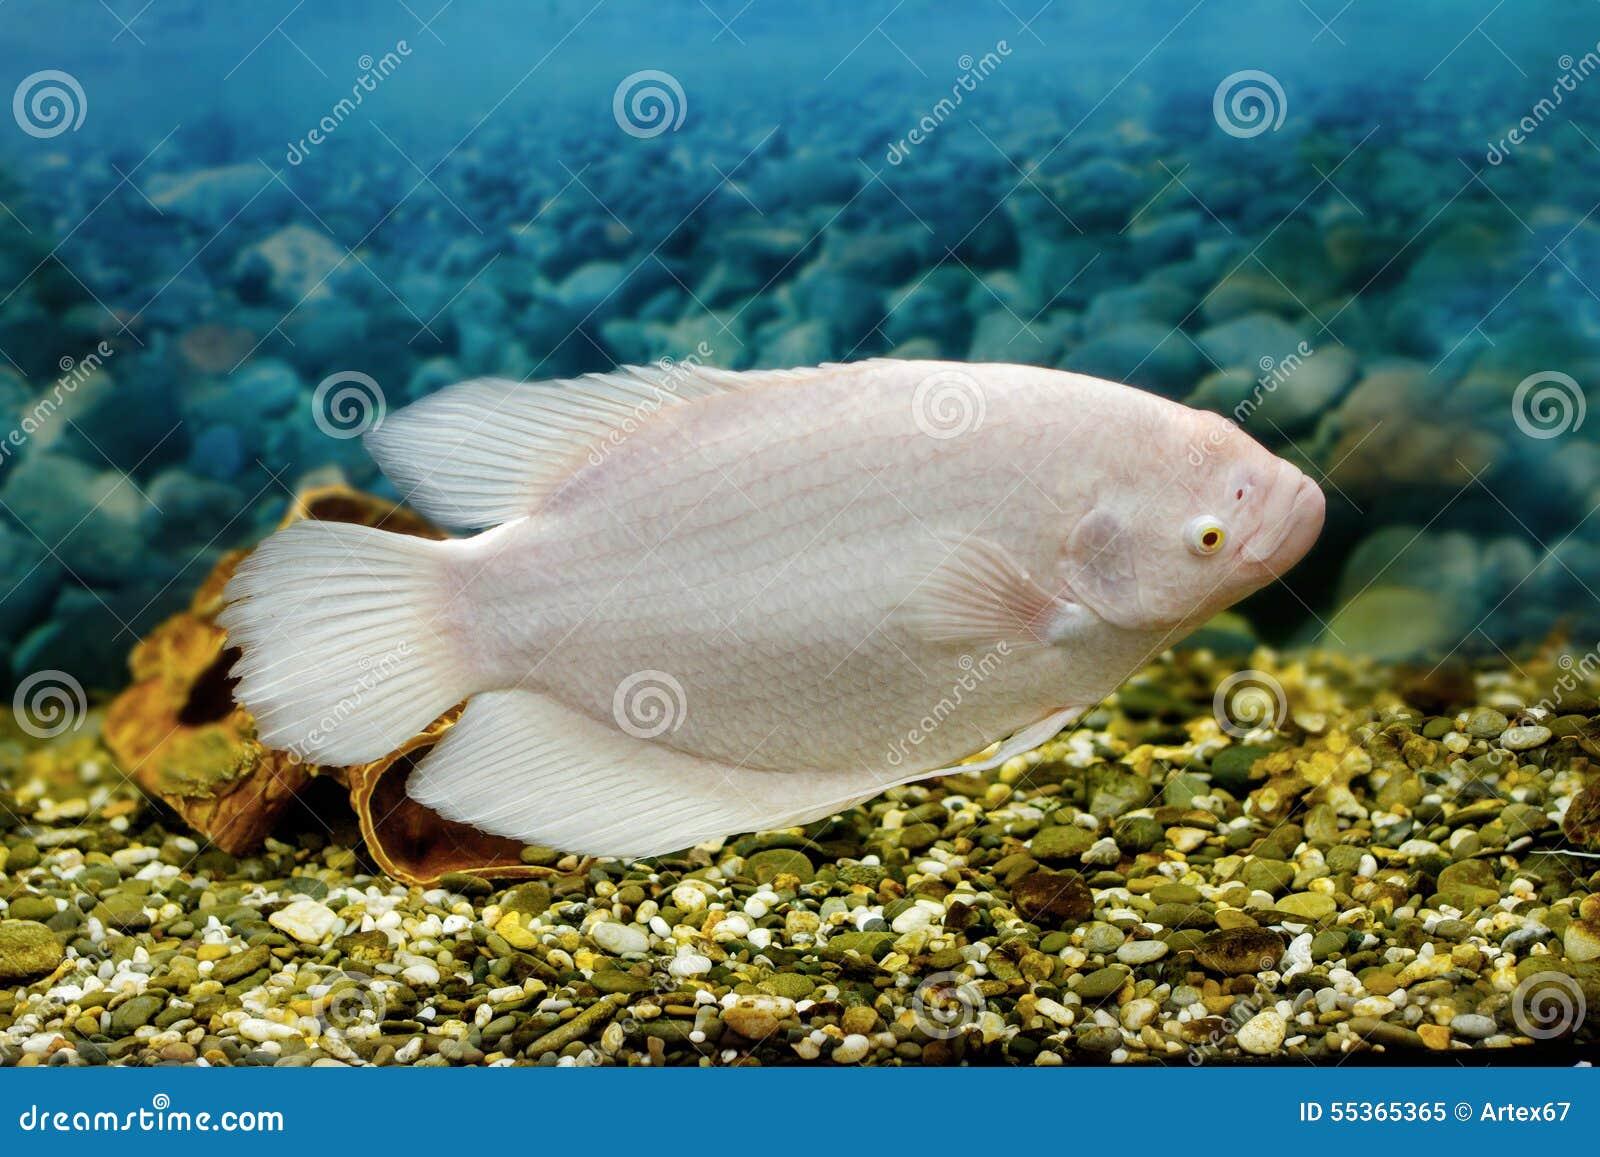 Fish in big aquarium - Big Fish In The Aquarium Gourami Fishing Royalty Free Stock Photo